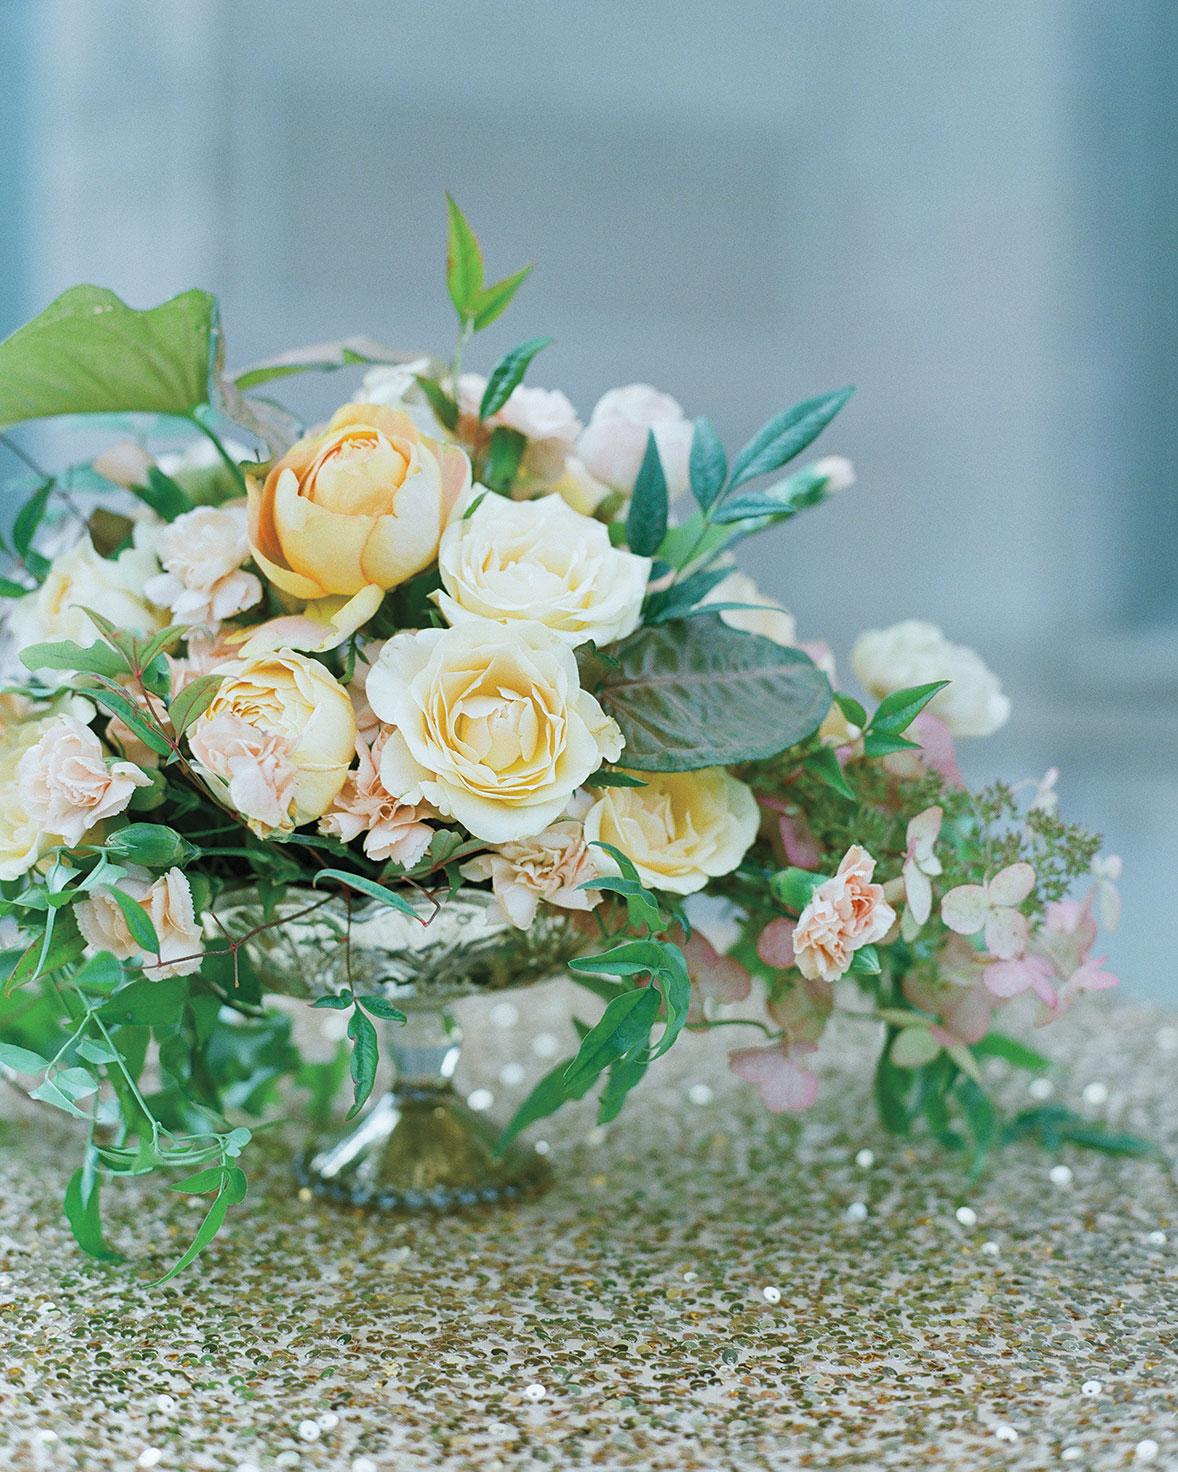 flower arrangement home decor allium rustic arrangement.htm 50 wedding centerpiece ideas we love martha stewart weddings  50 wedding centerpiece ideas we love